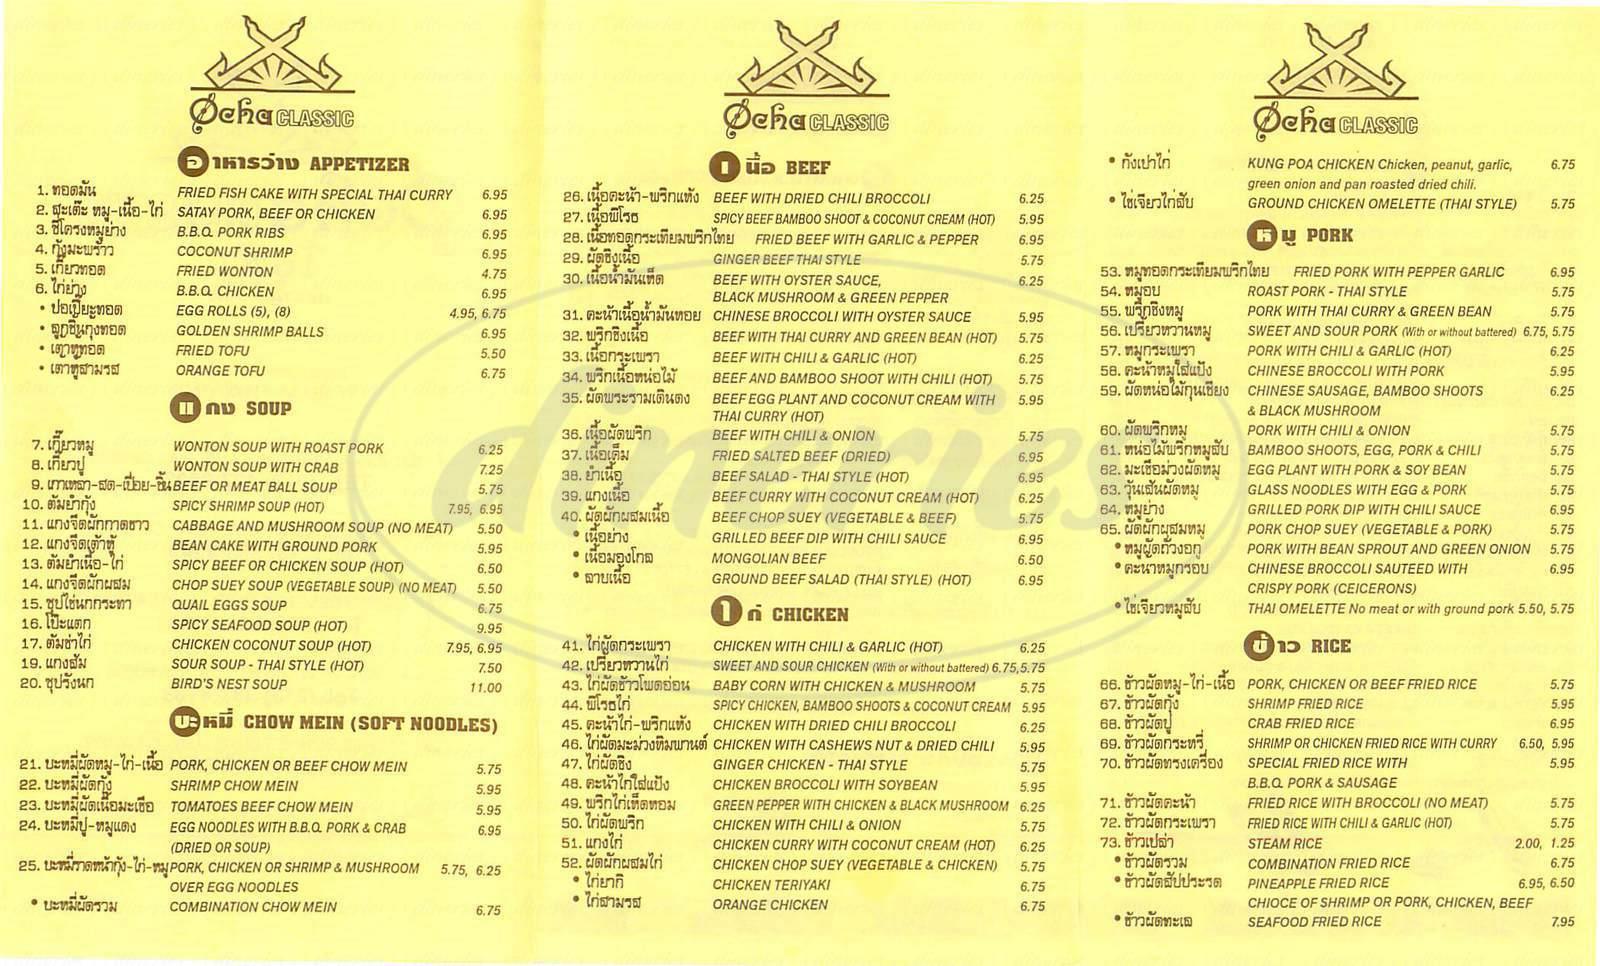 menu for Ocha Classic